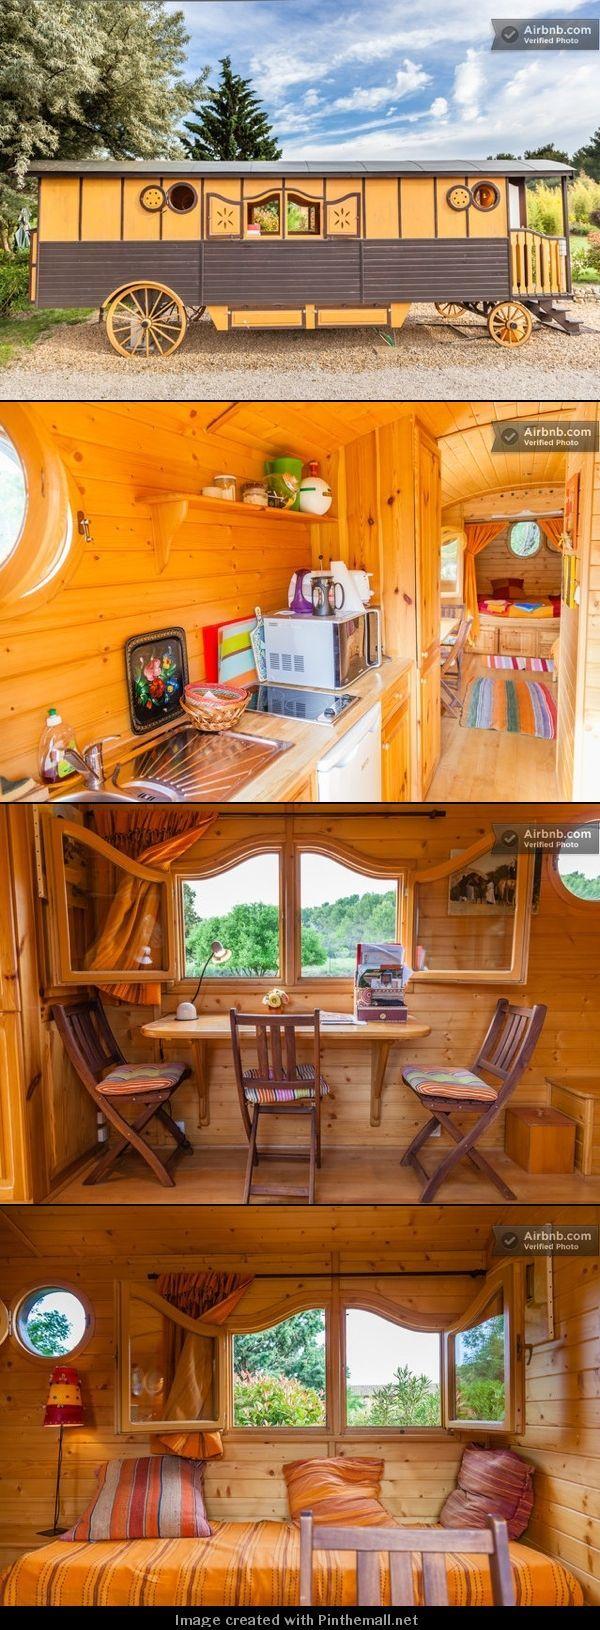 Nice caravan interior... - created via pinthemall.net